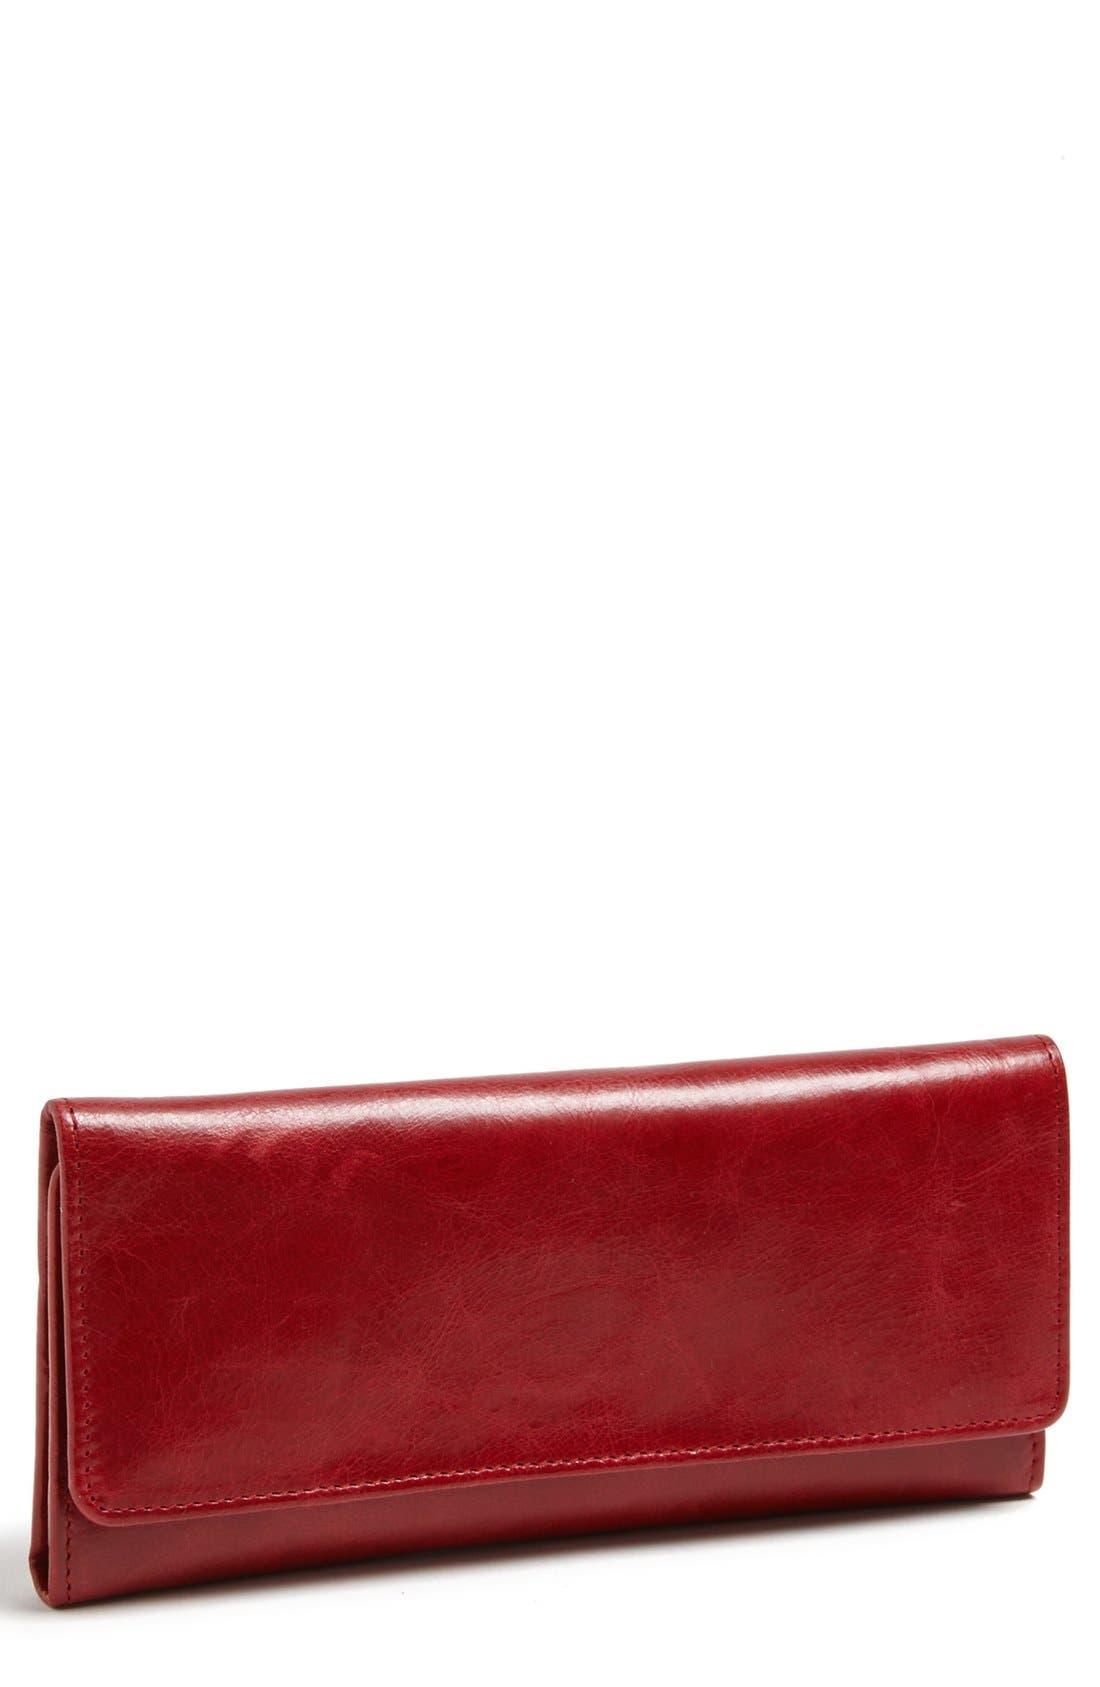 'Sadie' Leather Wallet,                             Main thumbnail 58, color,